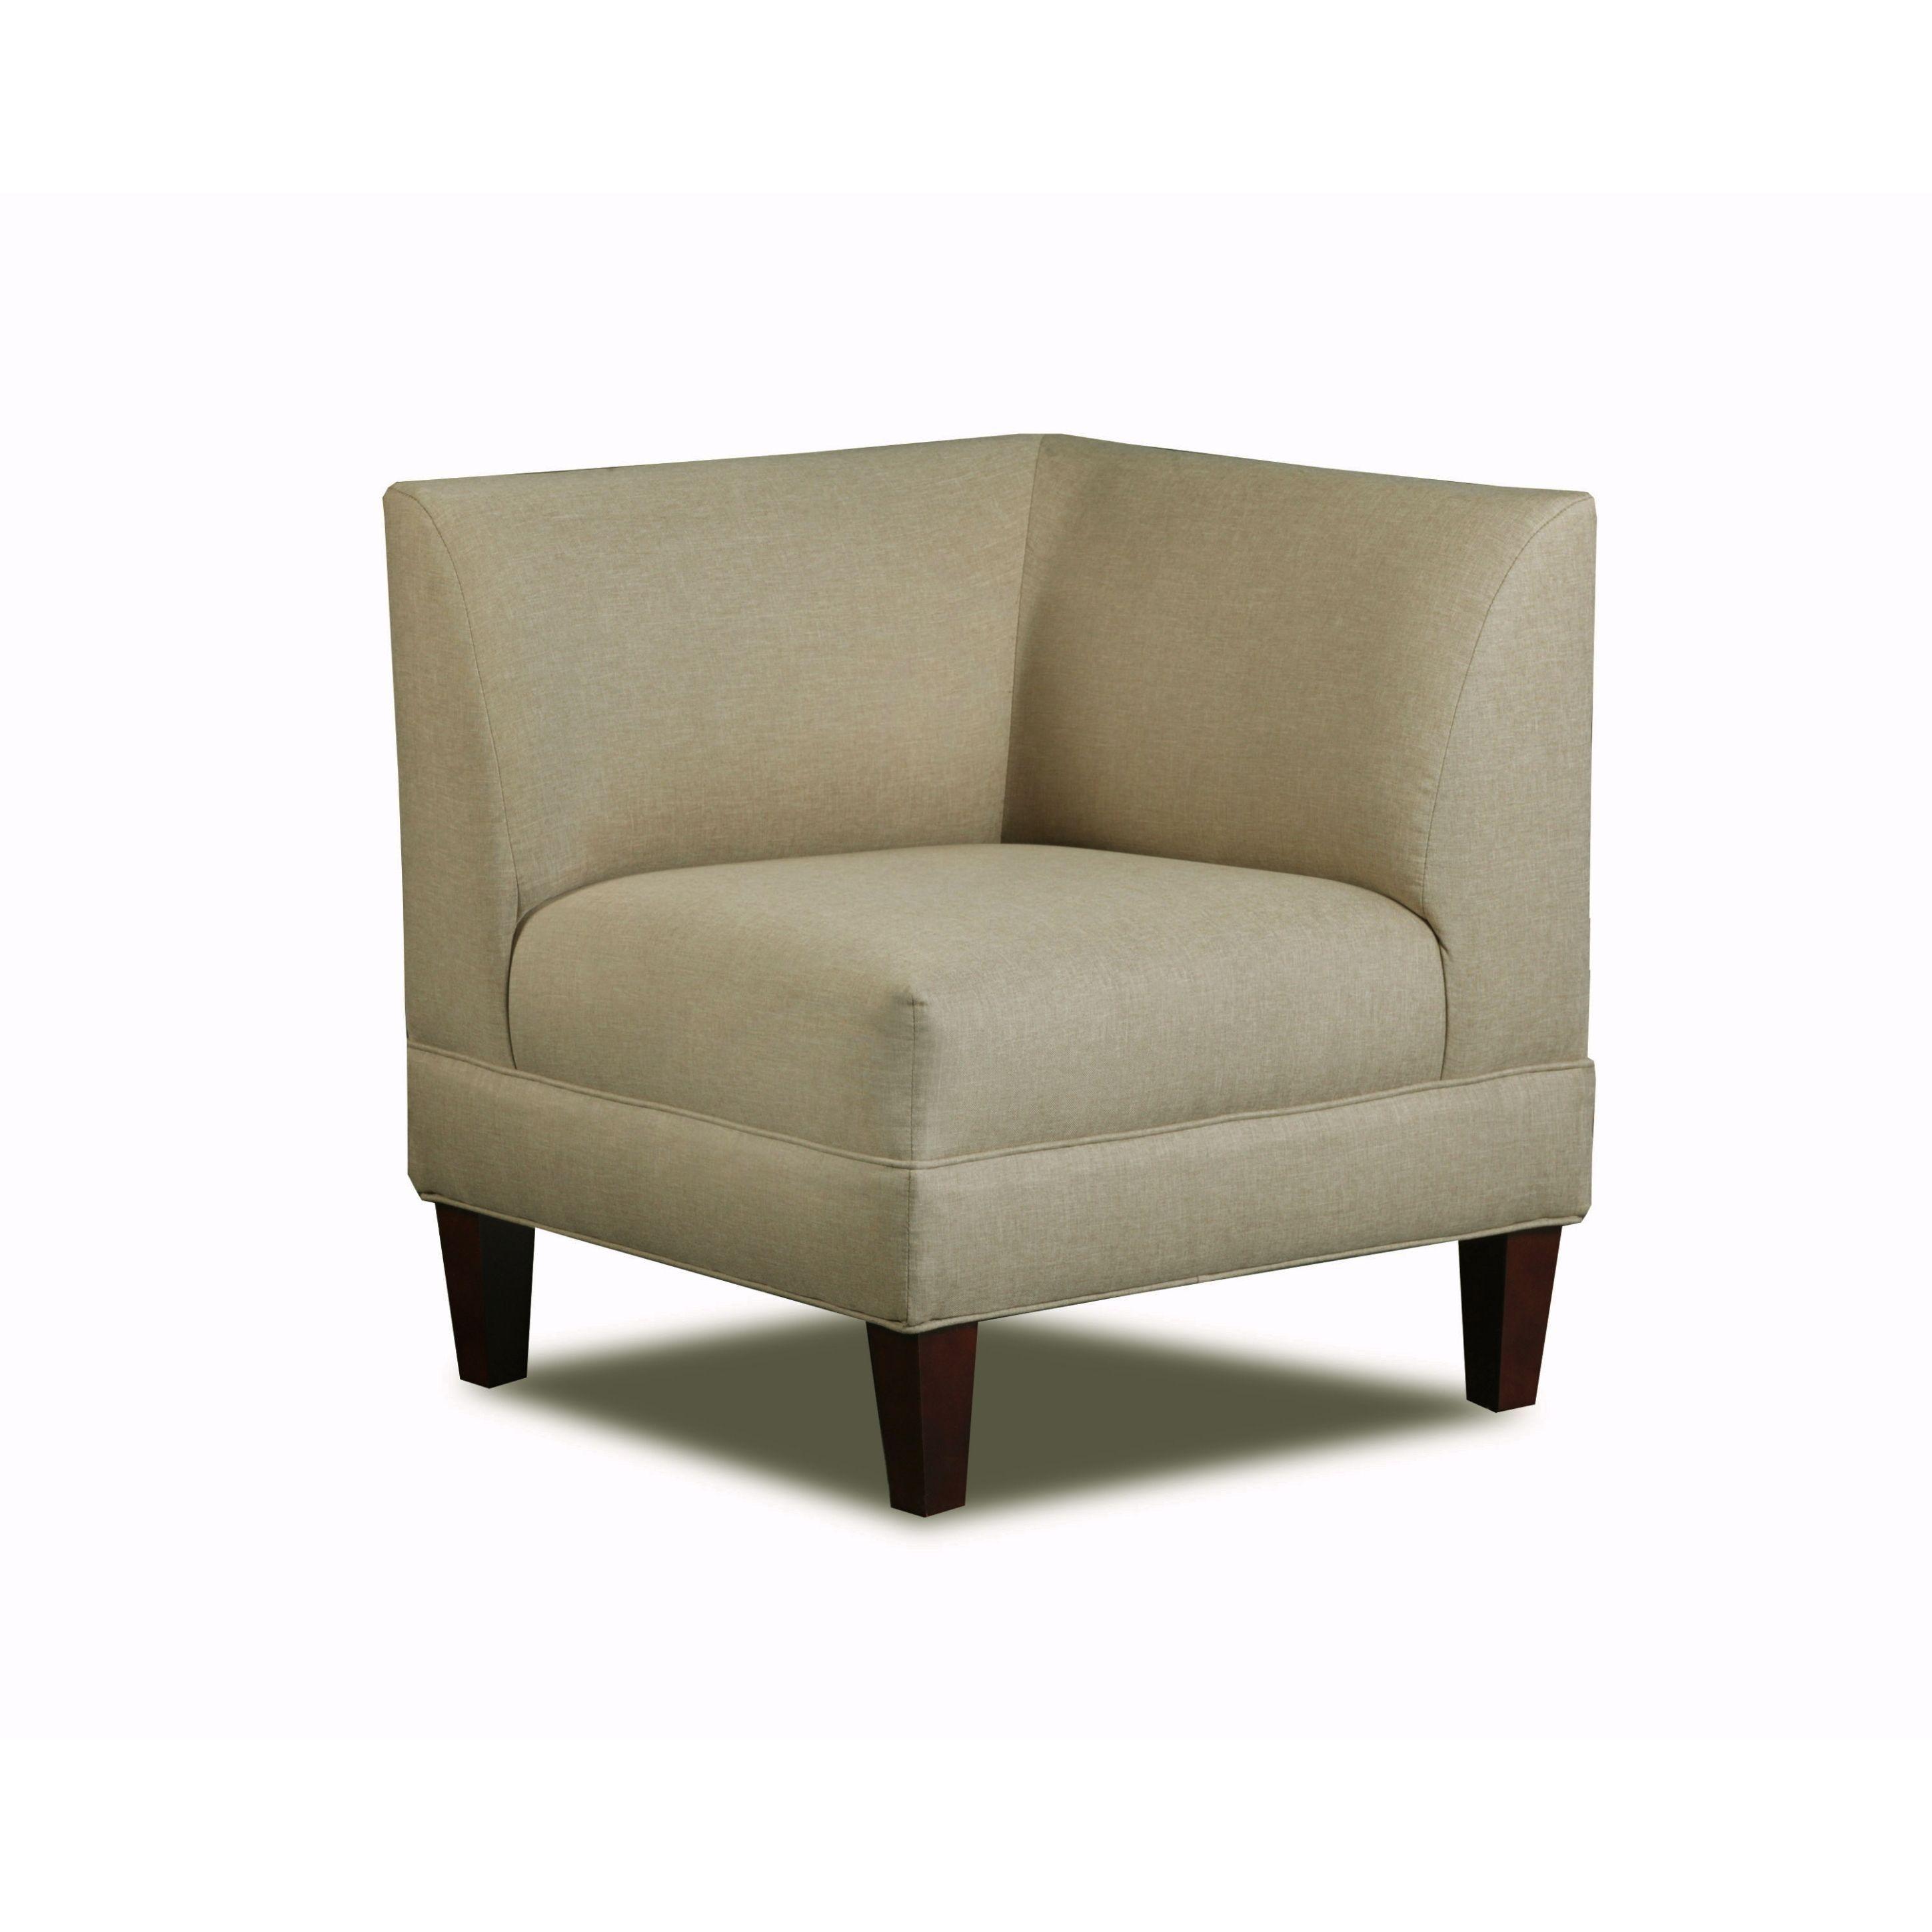 Carolina Accents Briley Sand Corner Chair Sand Ivory Cream